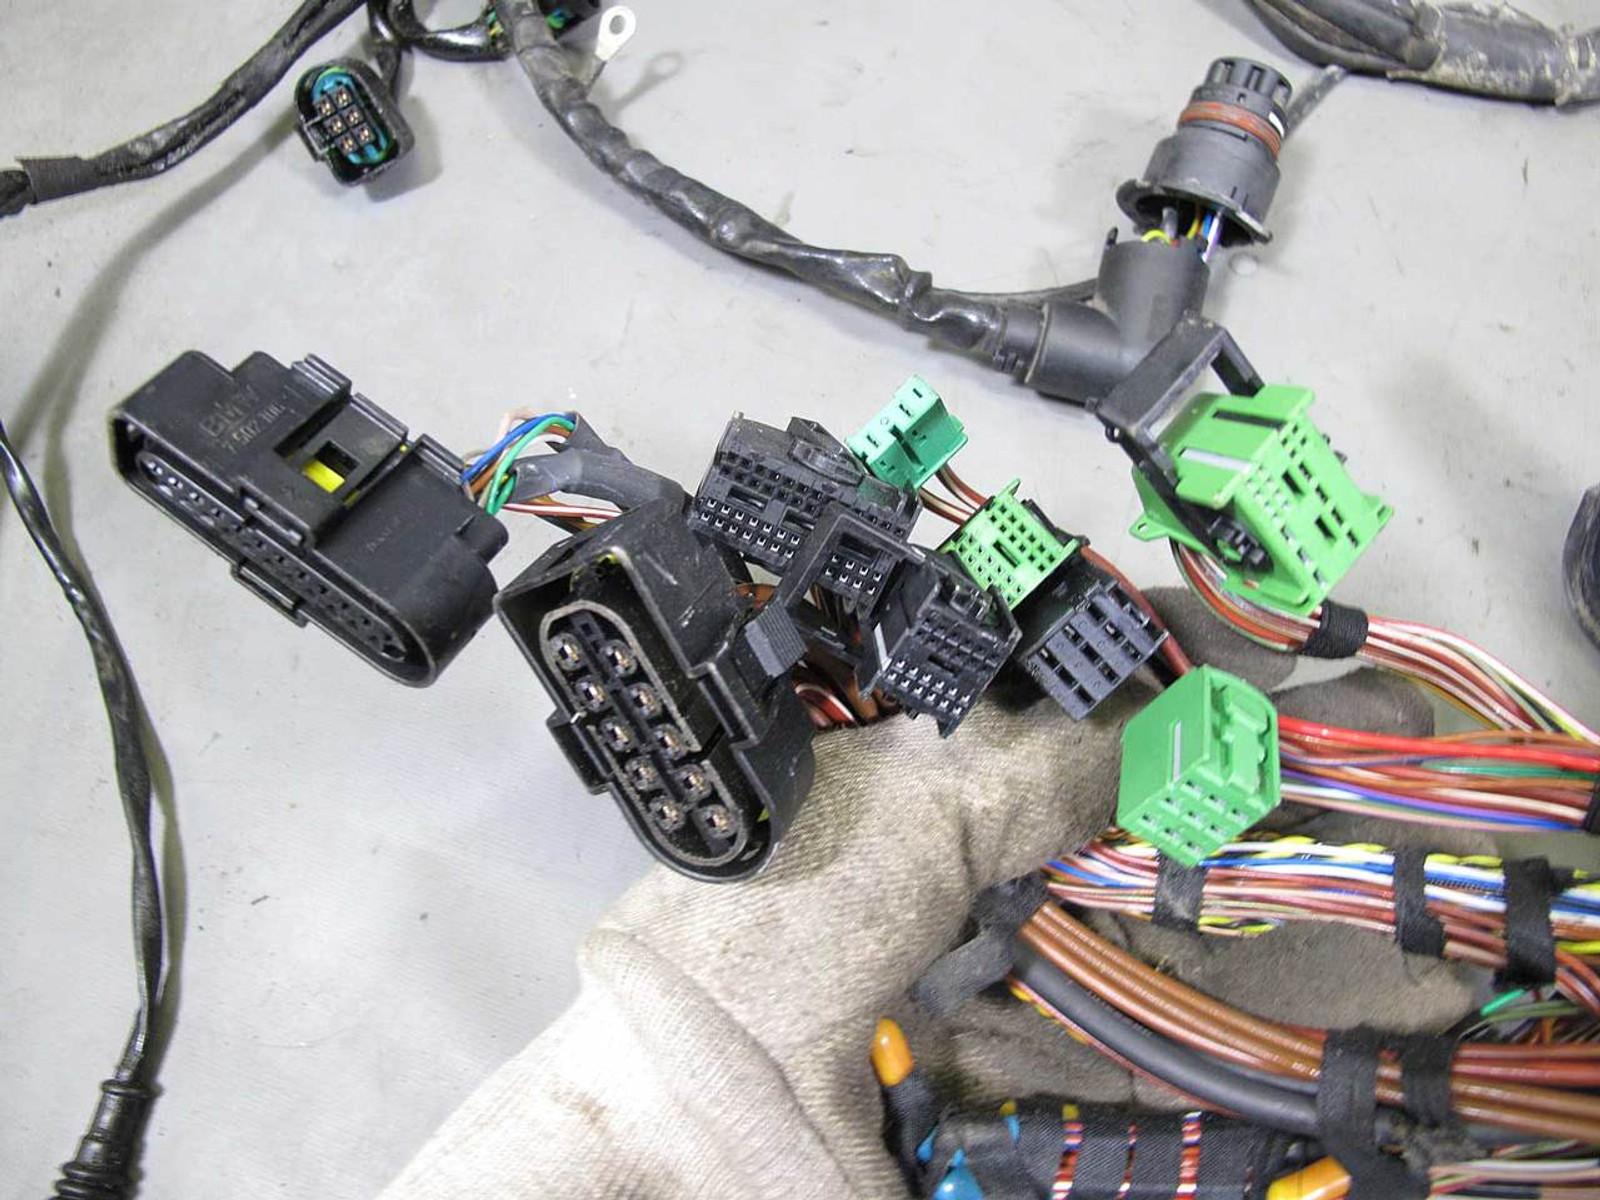 2006 Bmw X5 Fuse Diagram Electrical Wiring Diagrams E53 Box 2002 Motor Harness Schematics Data U2022 Location